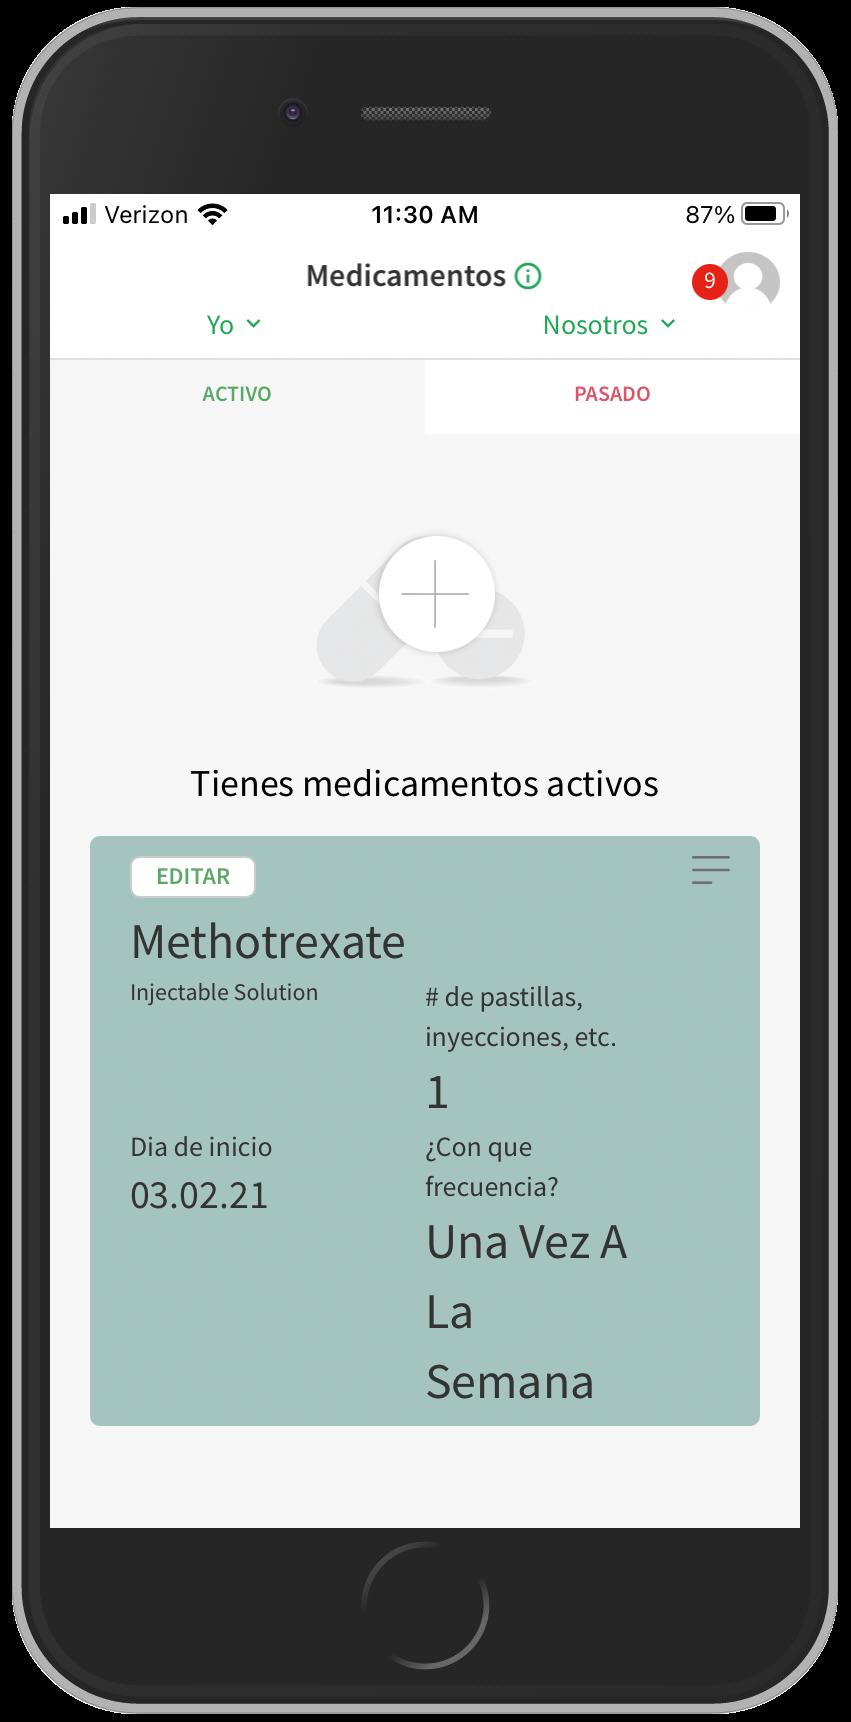 Screenshot of app showing medication entry screen